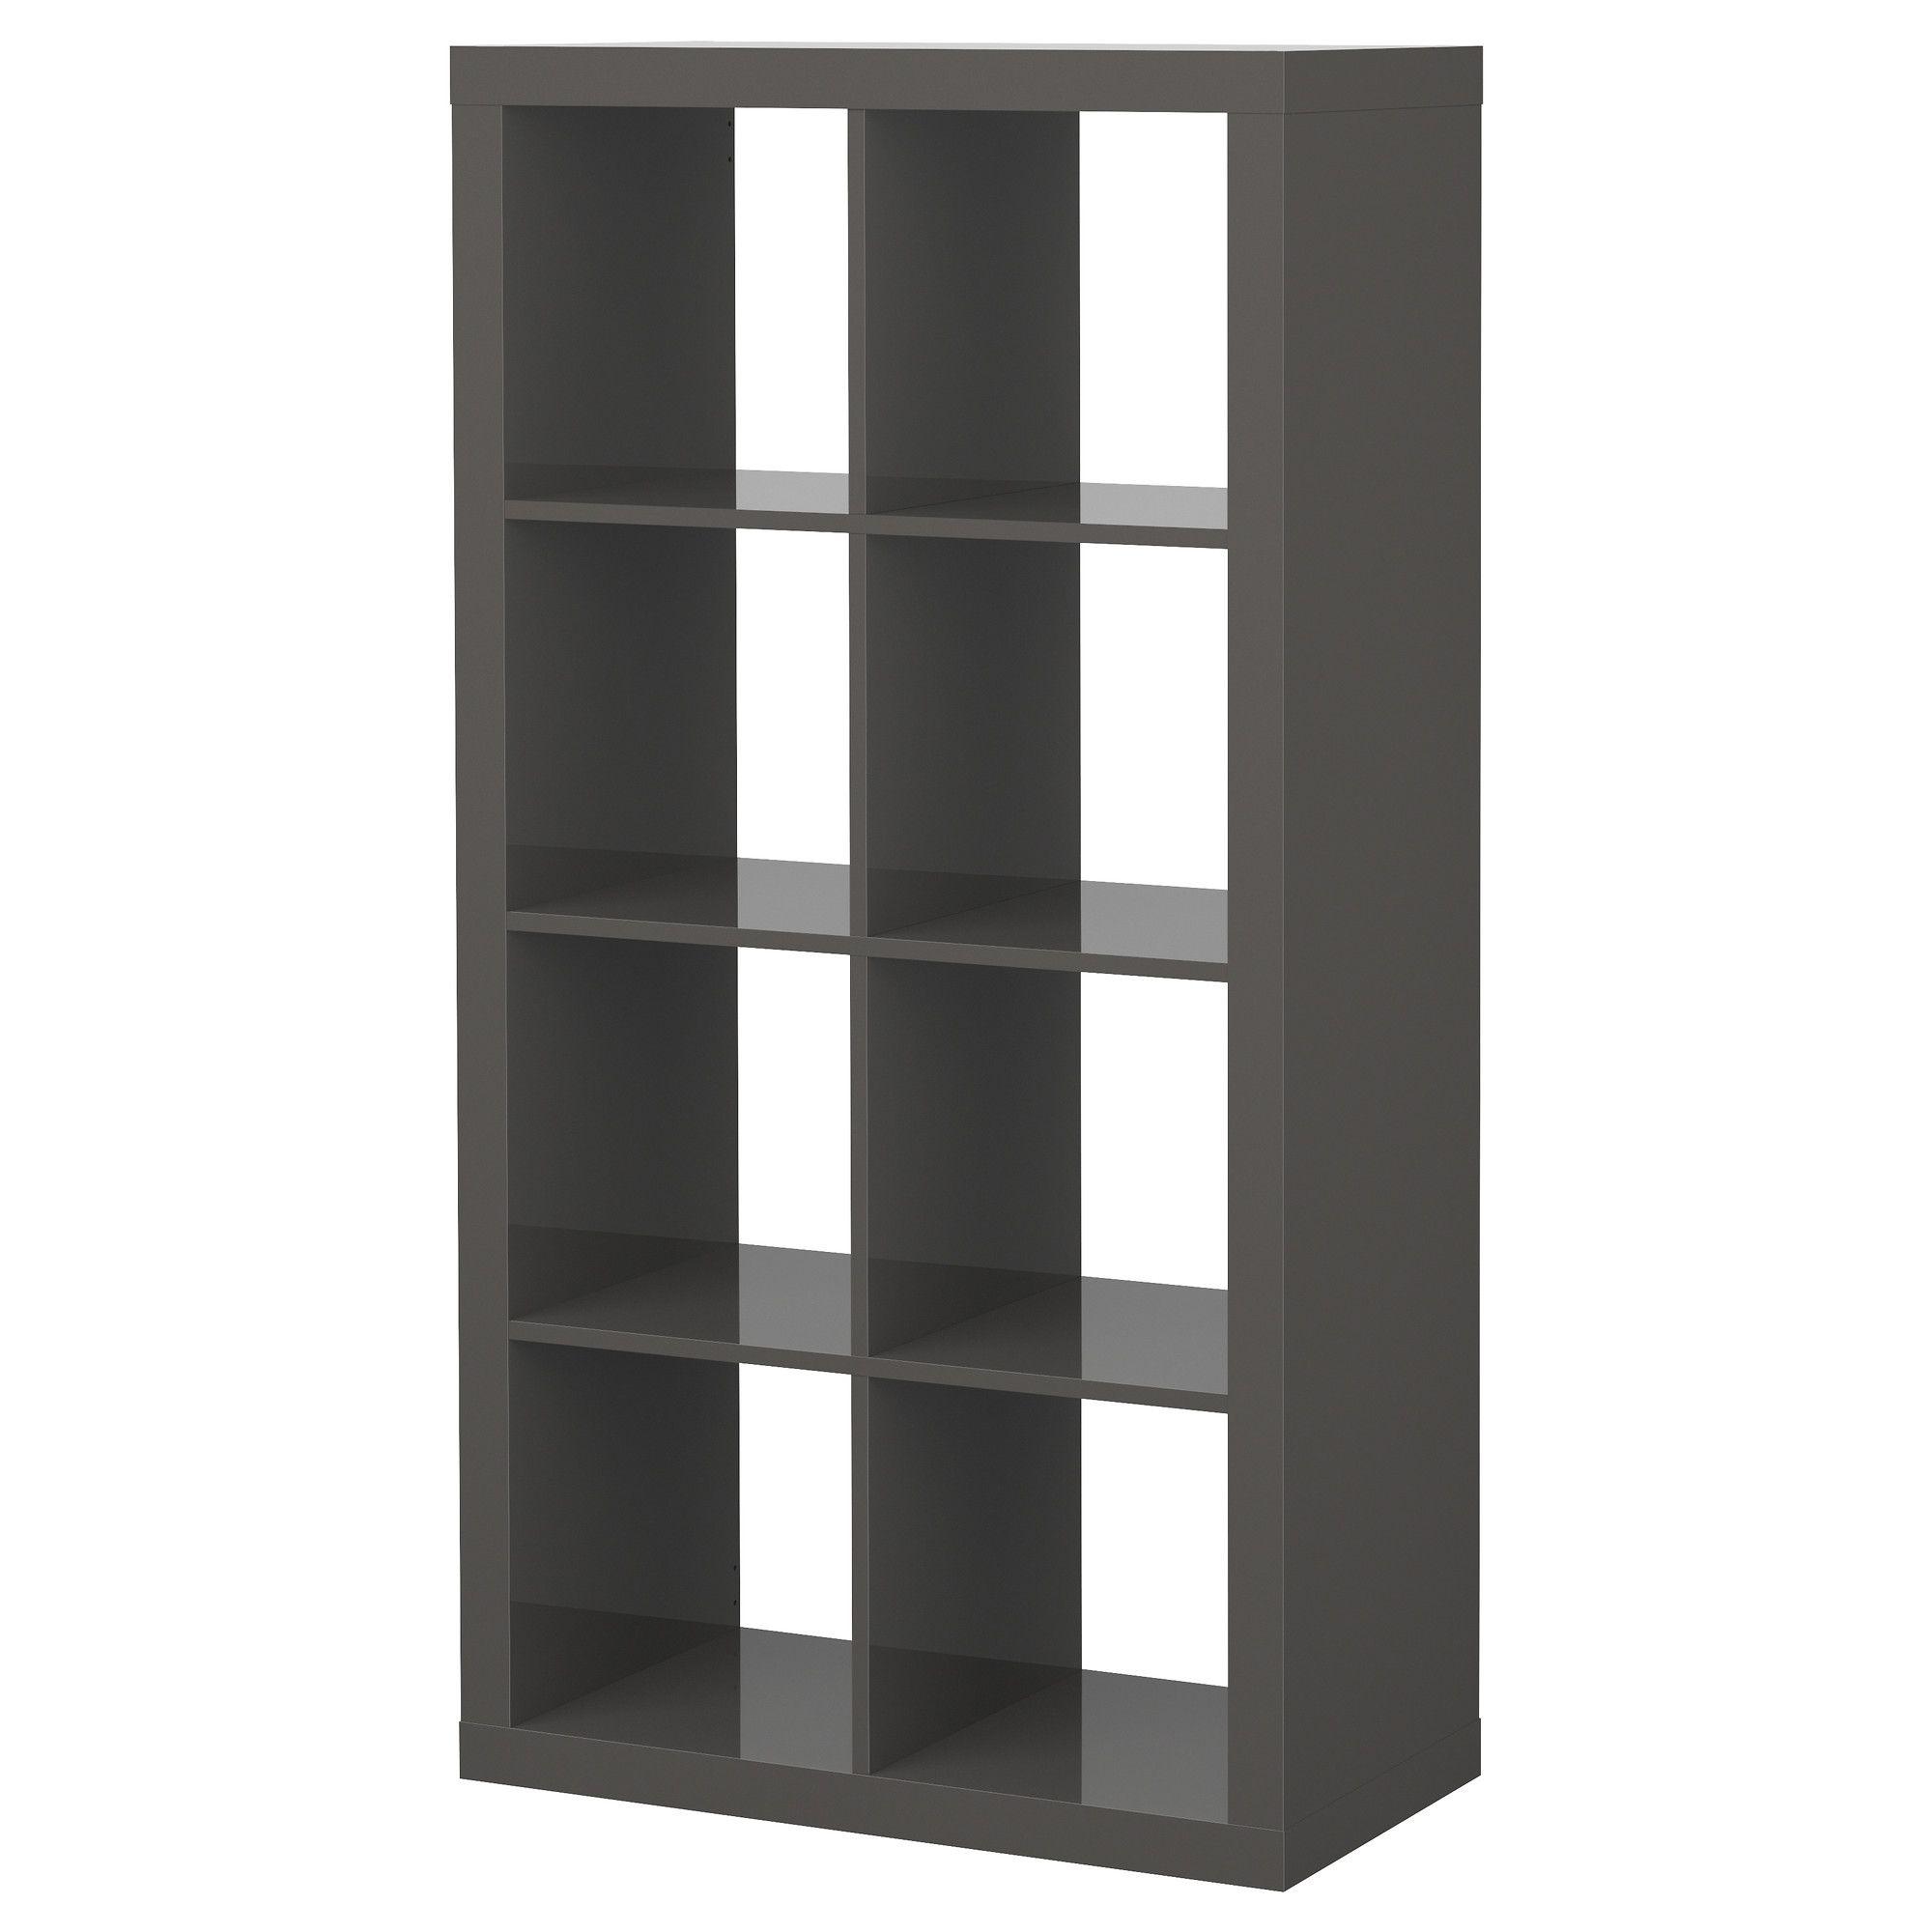 expedit shelving unit instructions